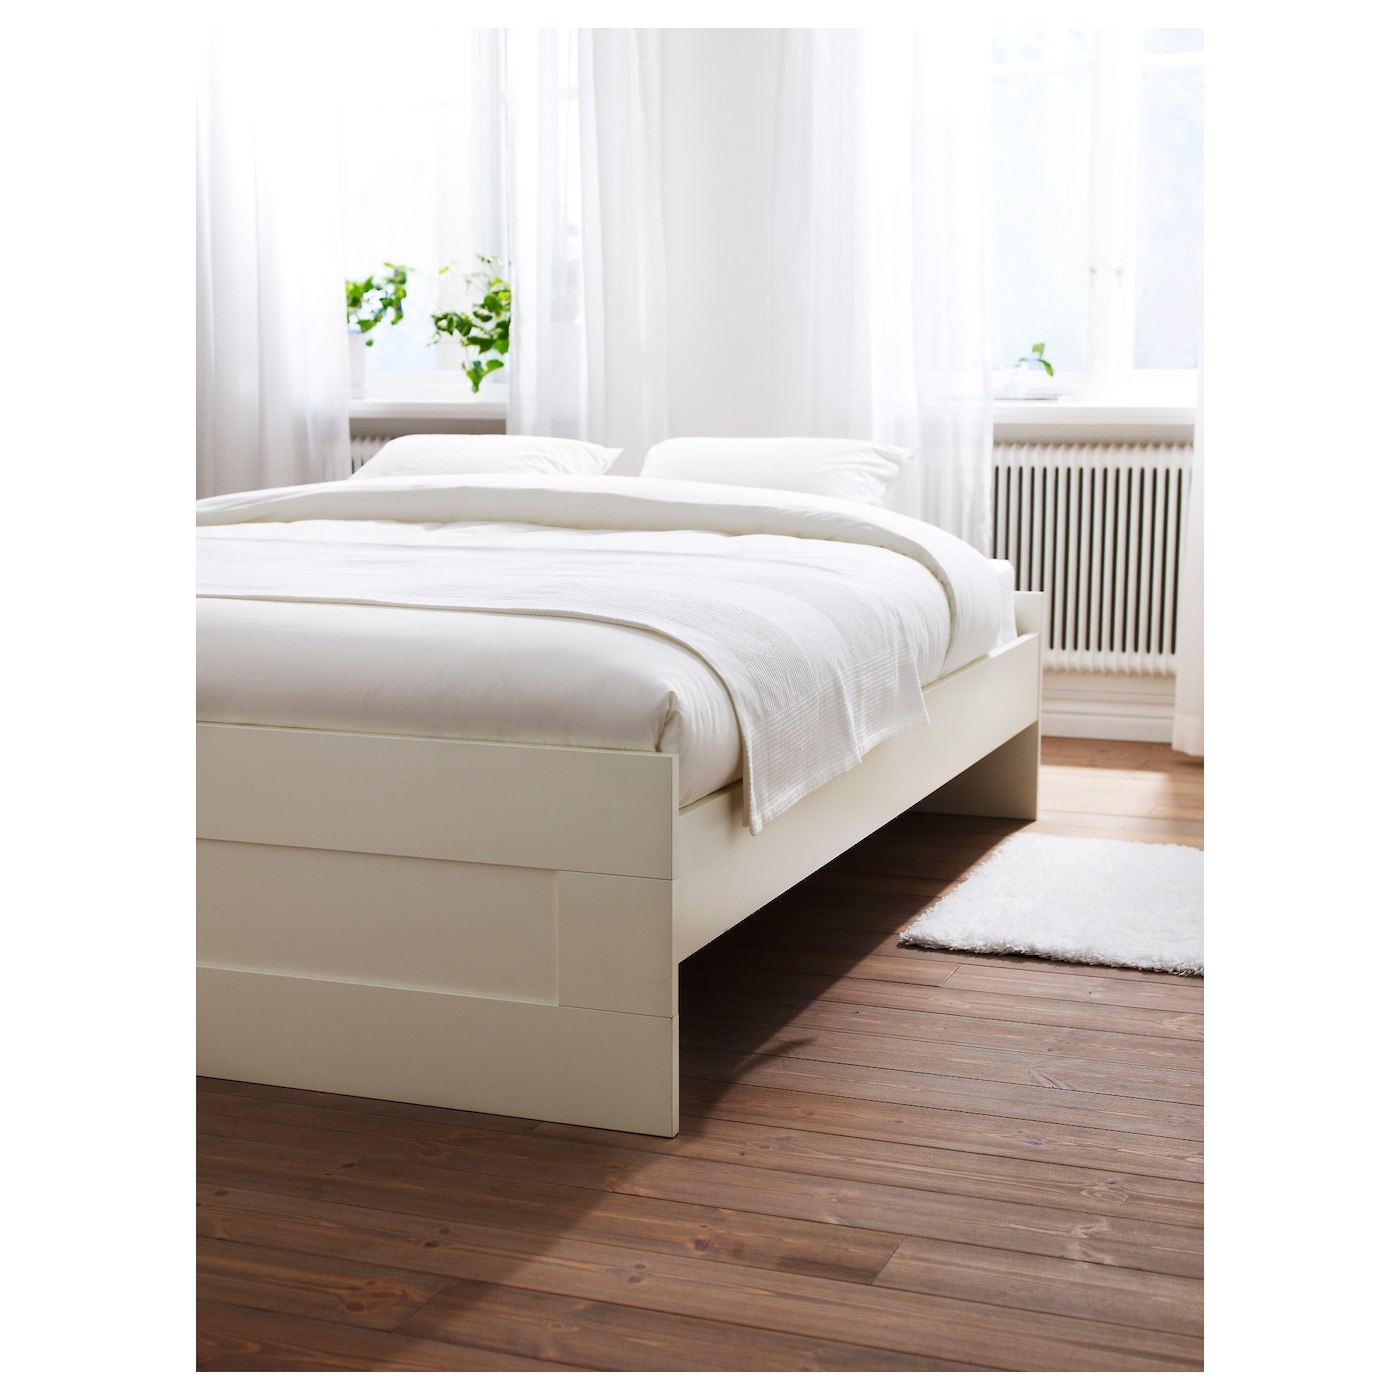 BRIMNES Bed frame White luröy 180×200 cm IKEA